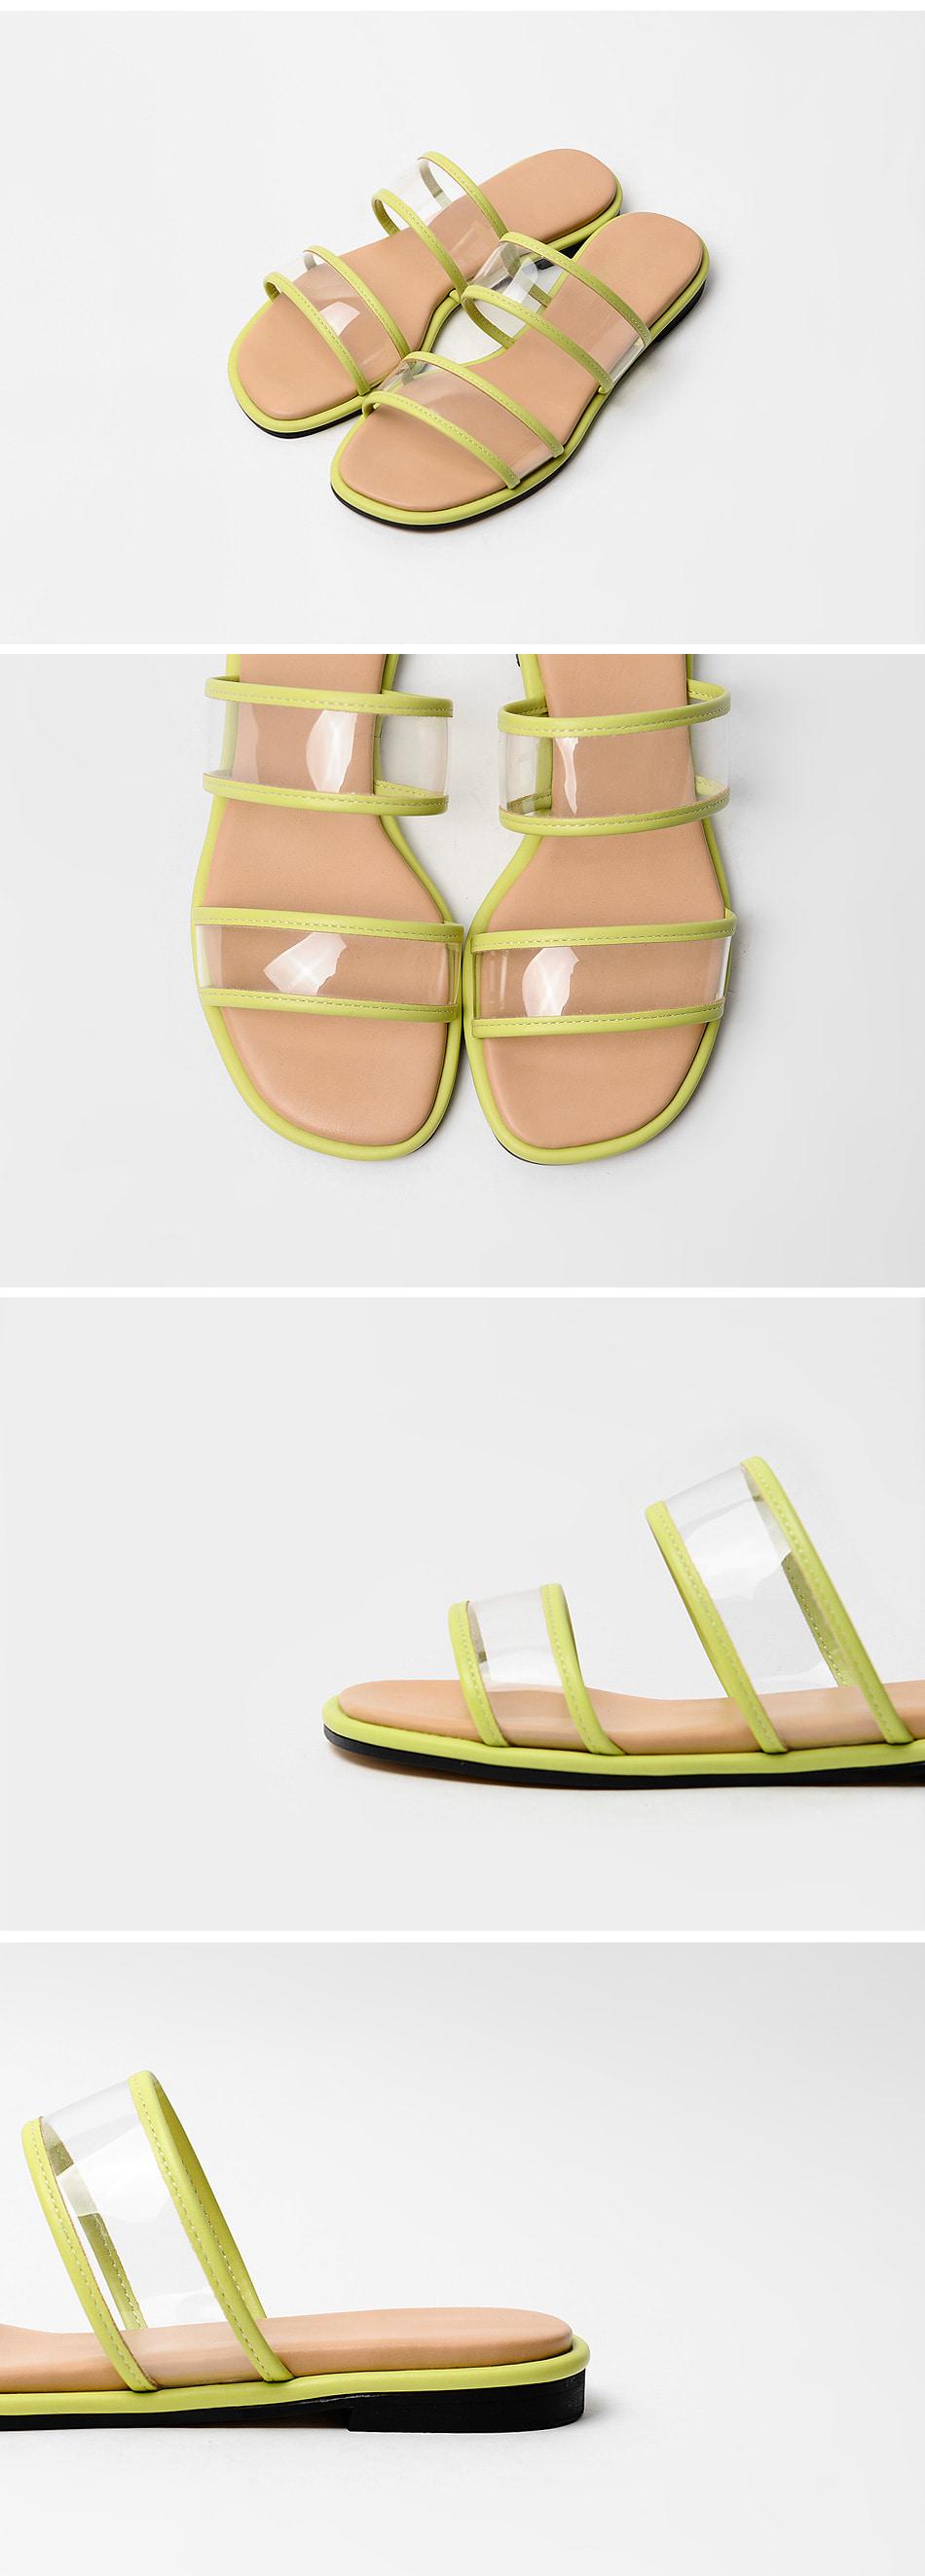 This felon PVC slippers 2cm